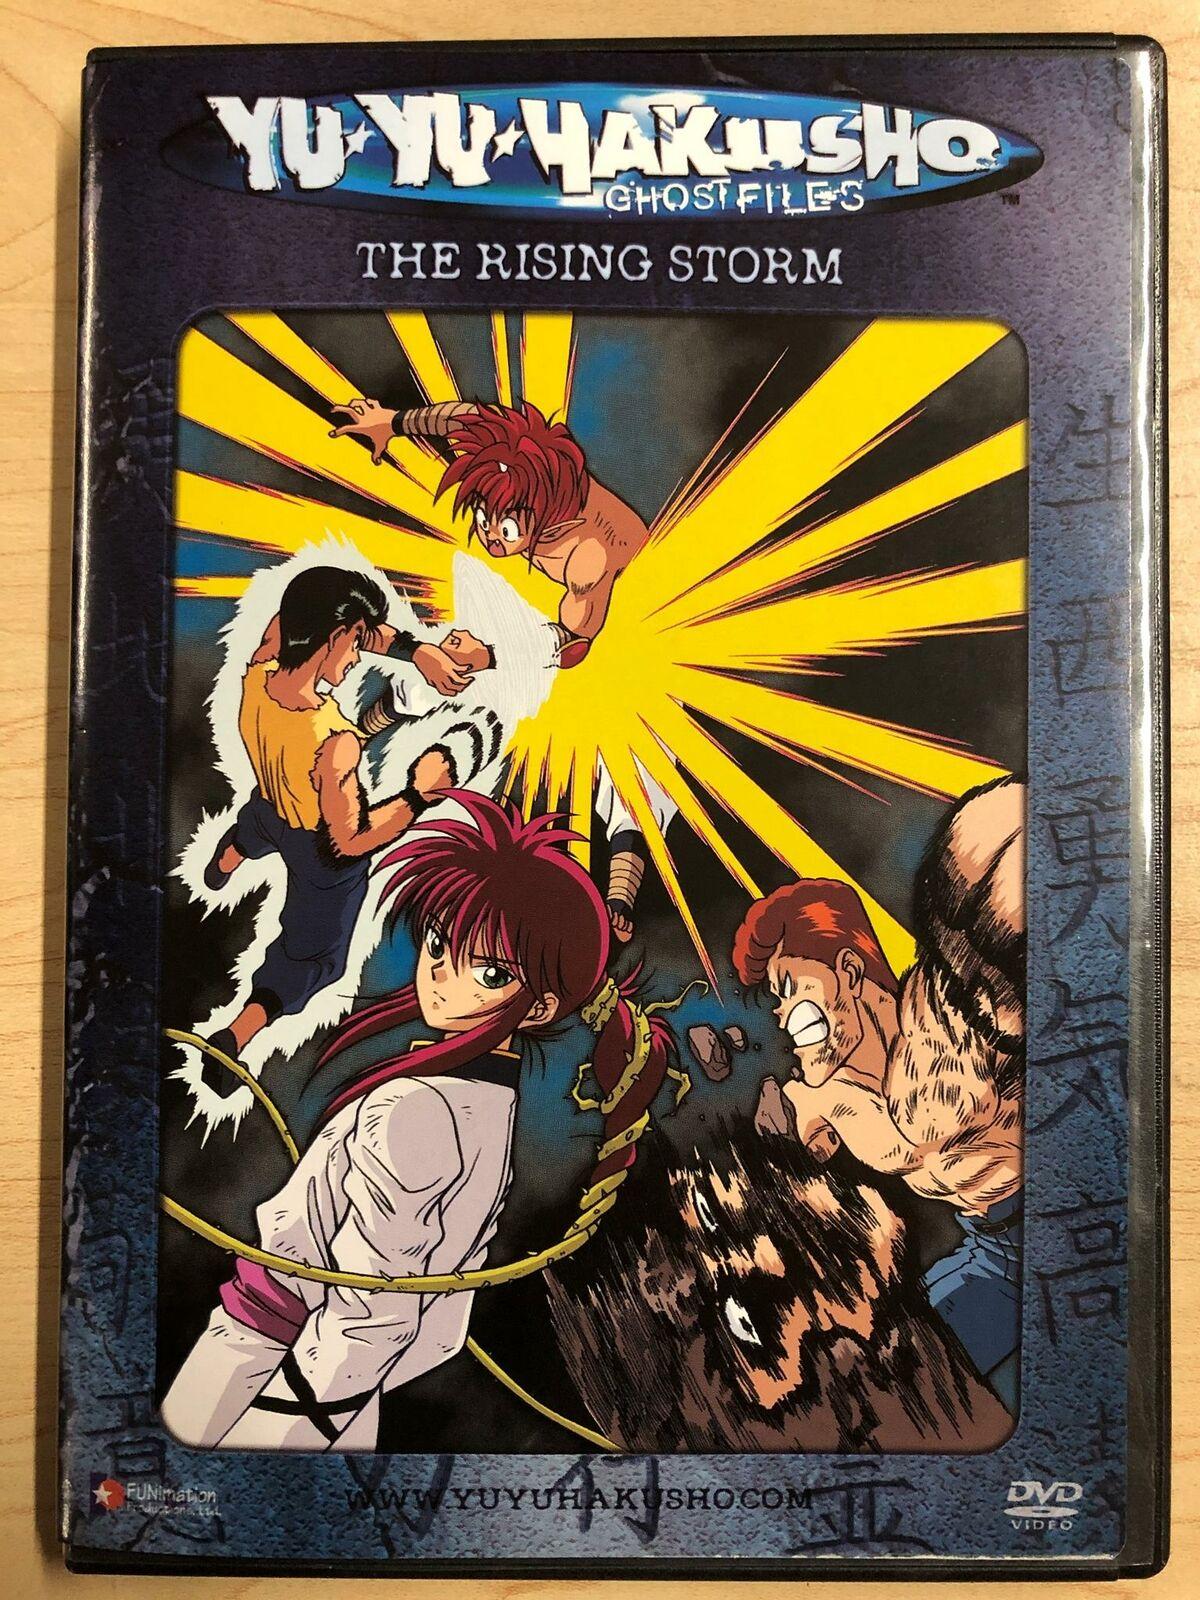 Yu Yu Hakusho Dark Tournament Saga Vol 12 The Rising Storm Dvd 2003 Unedited For Sale Online Ebay